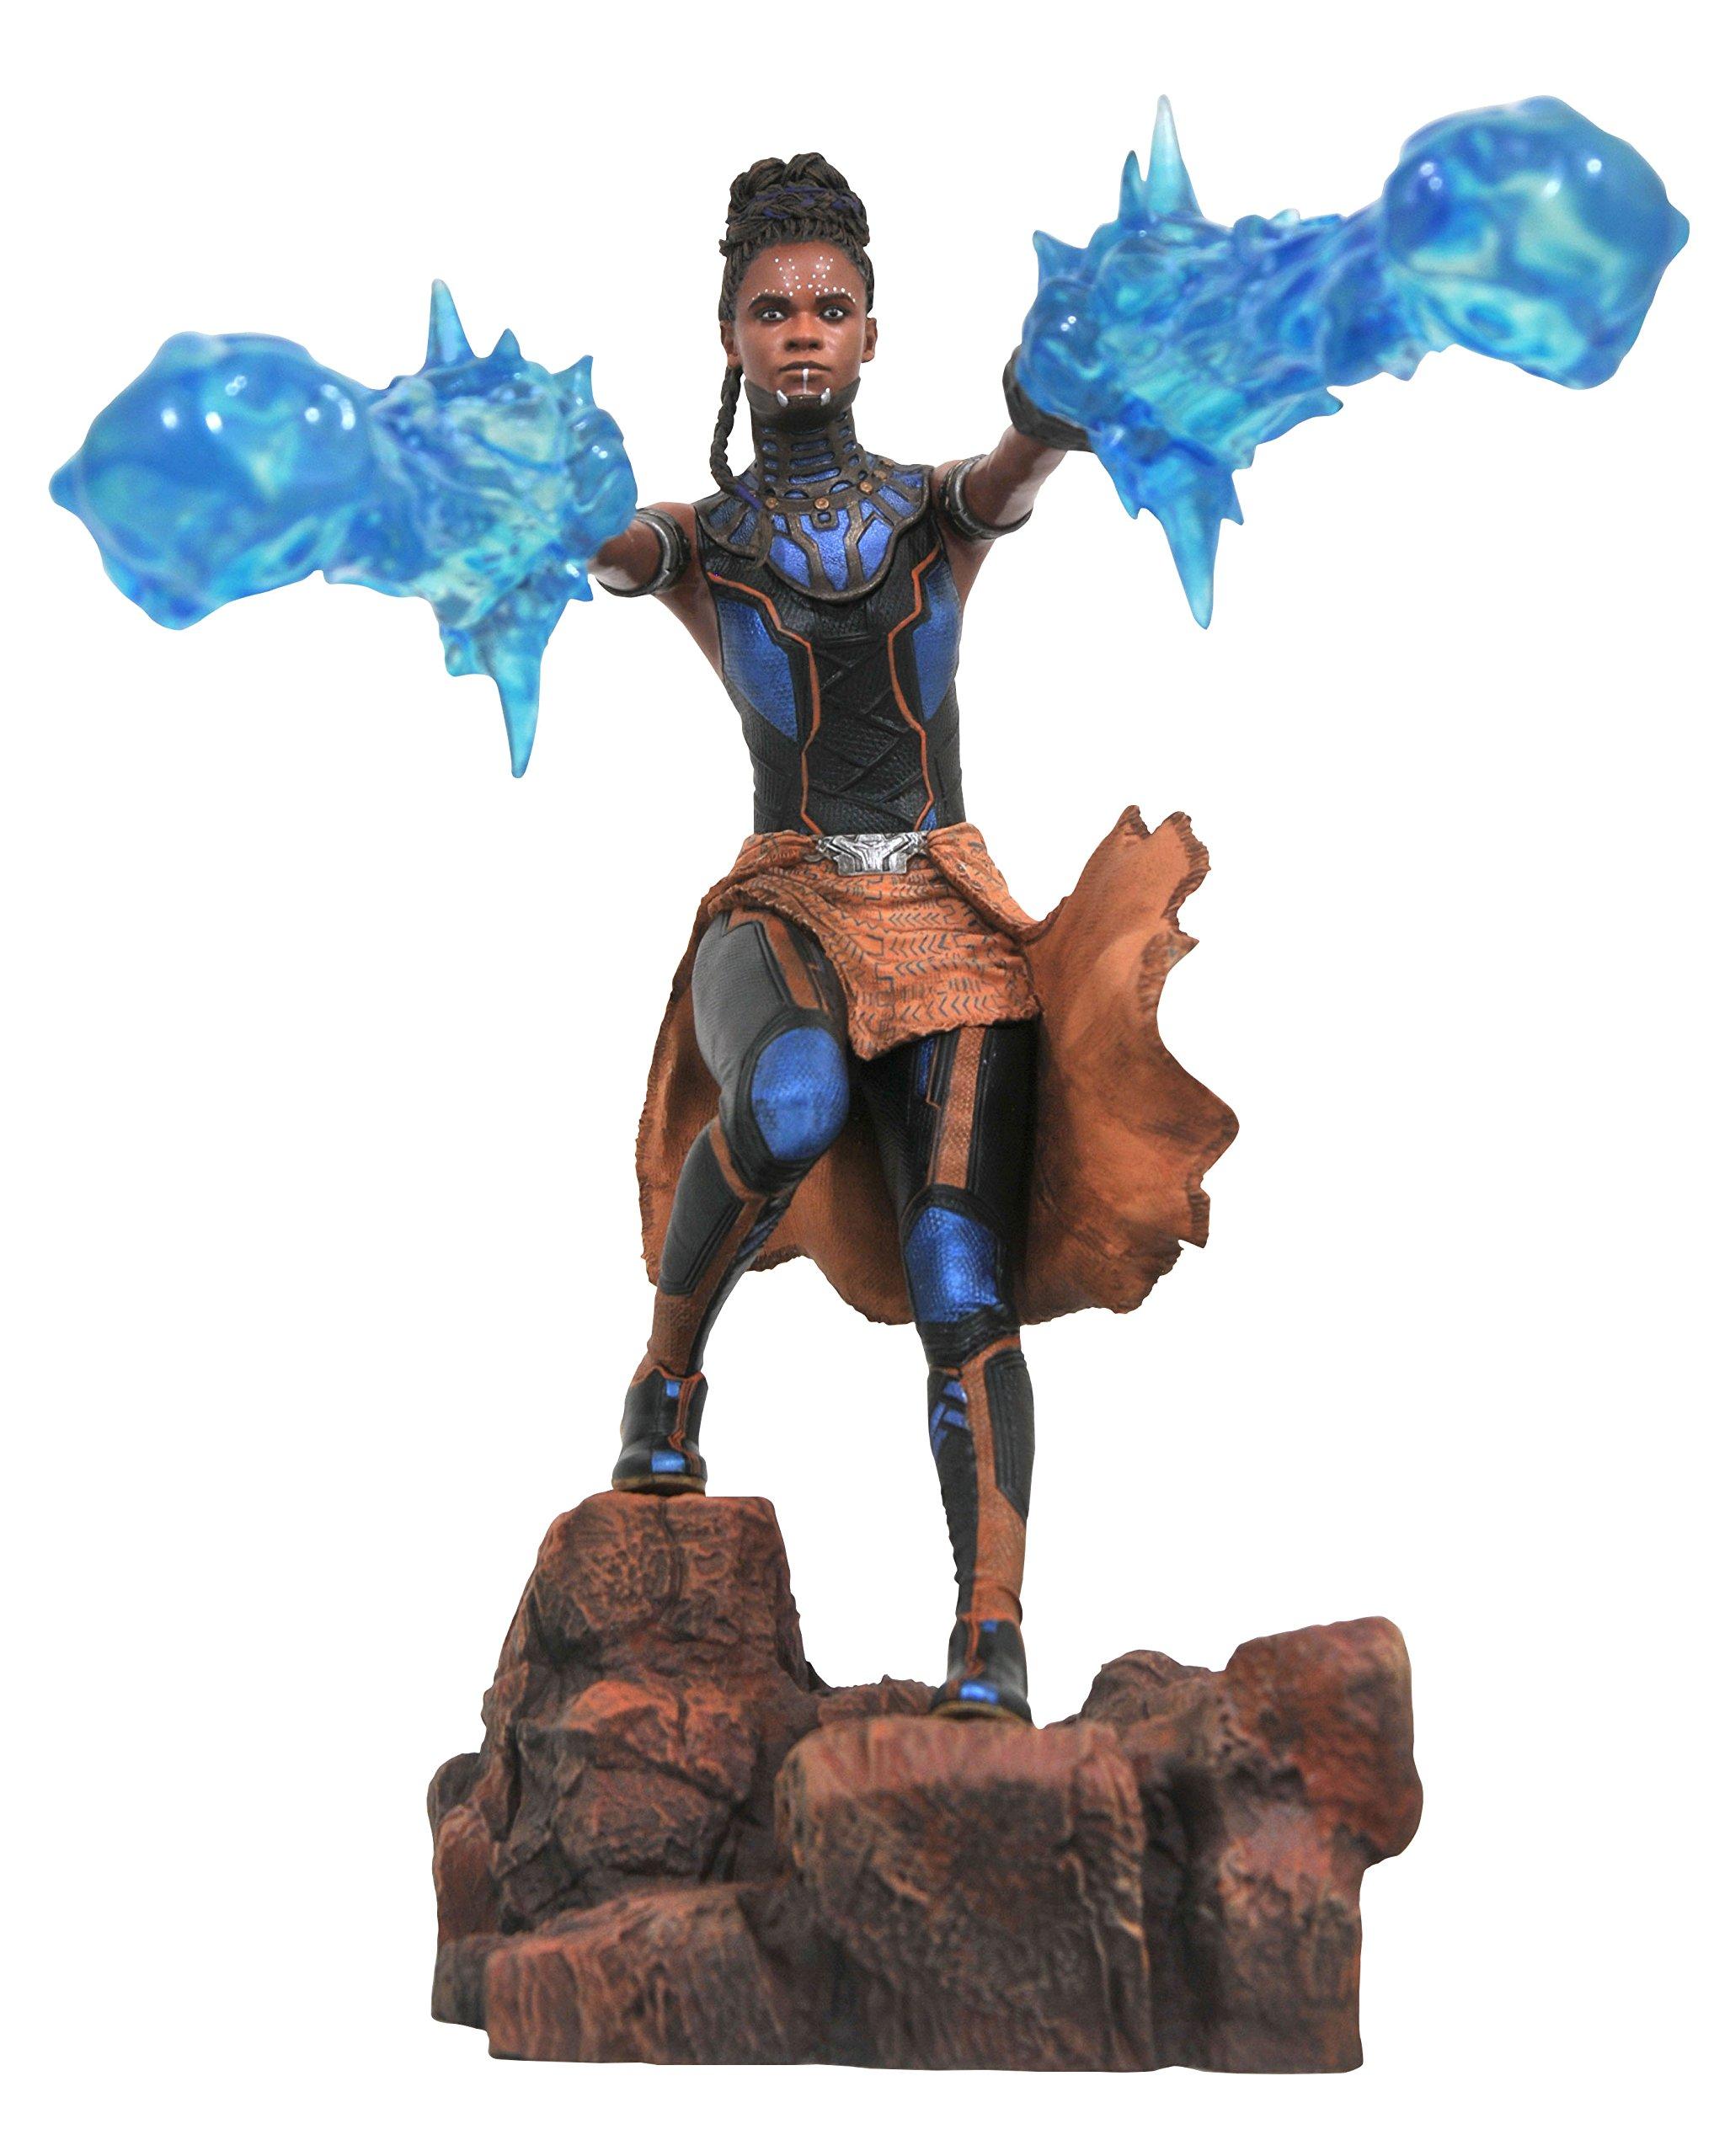 Black Panther Movie Pvc Vinyl Figure Diamond Select Toys Marvel Gallery